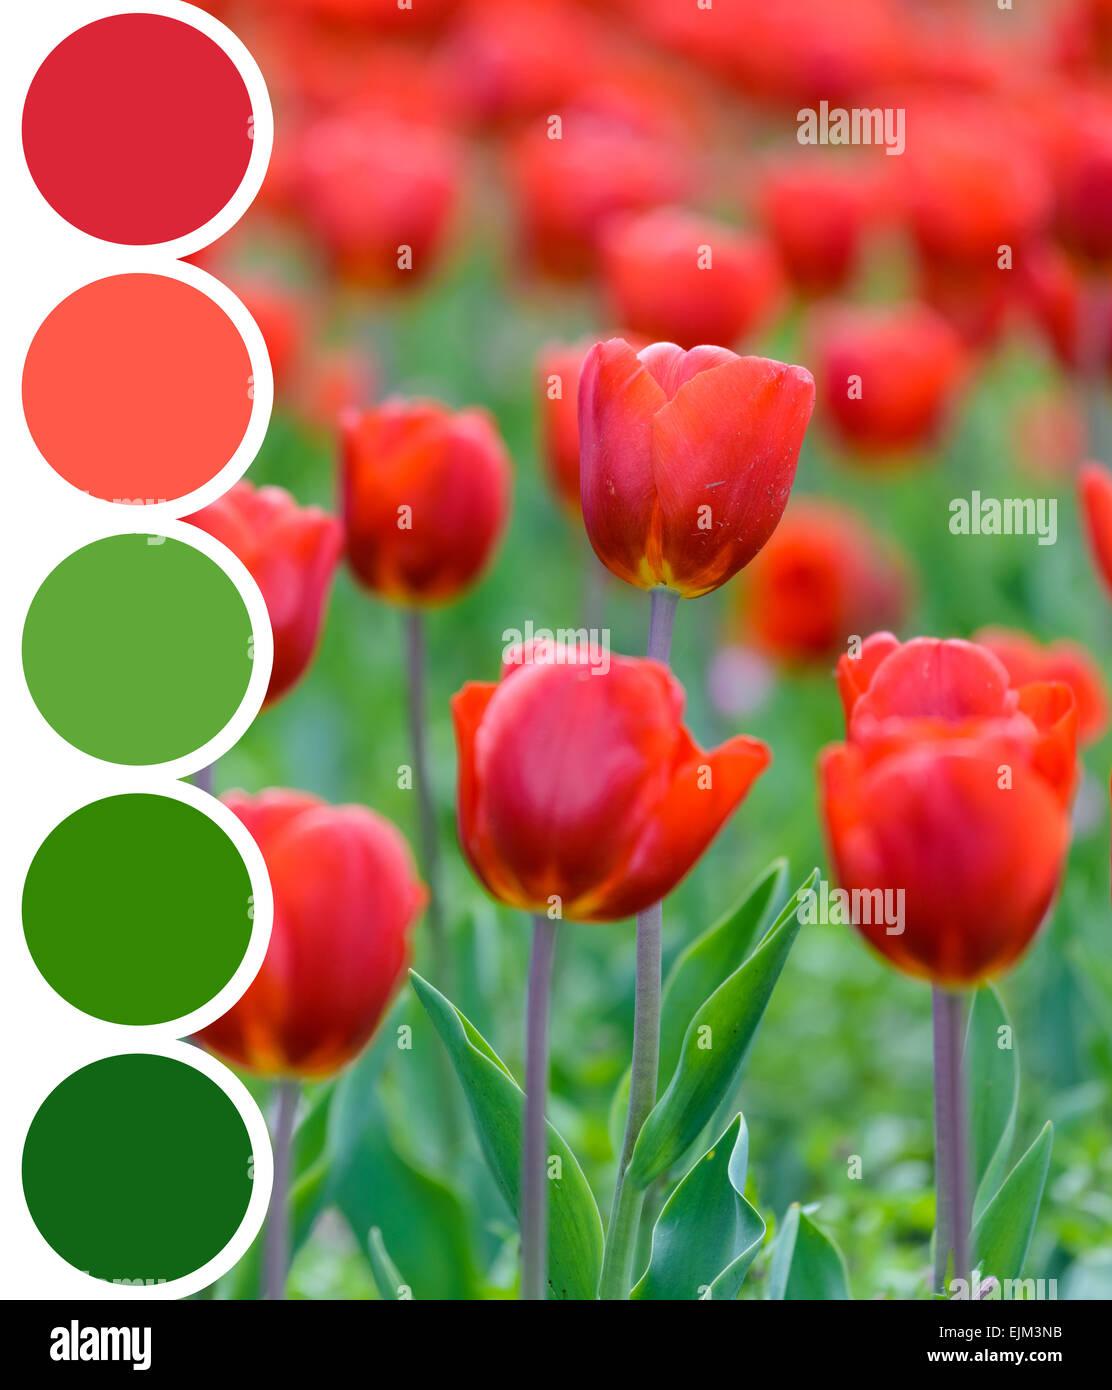 Color Palette Of Retro Spring Tulip Garden Stock Photo: 80347271 - Alamy